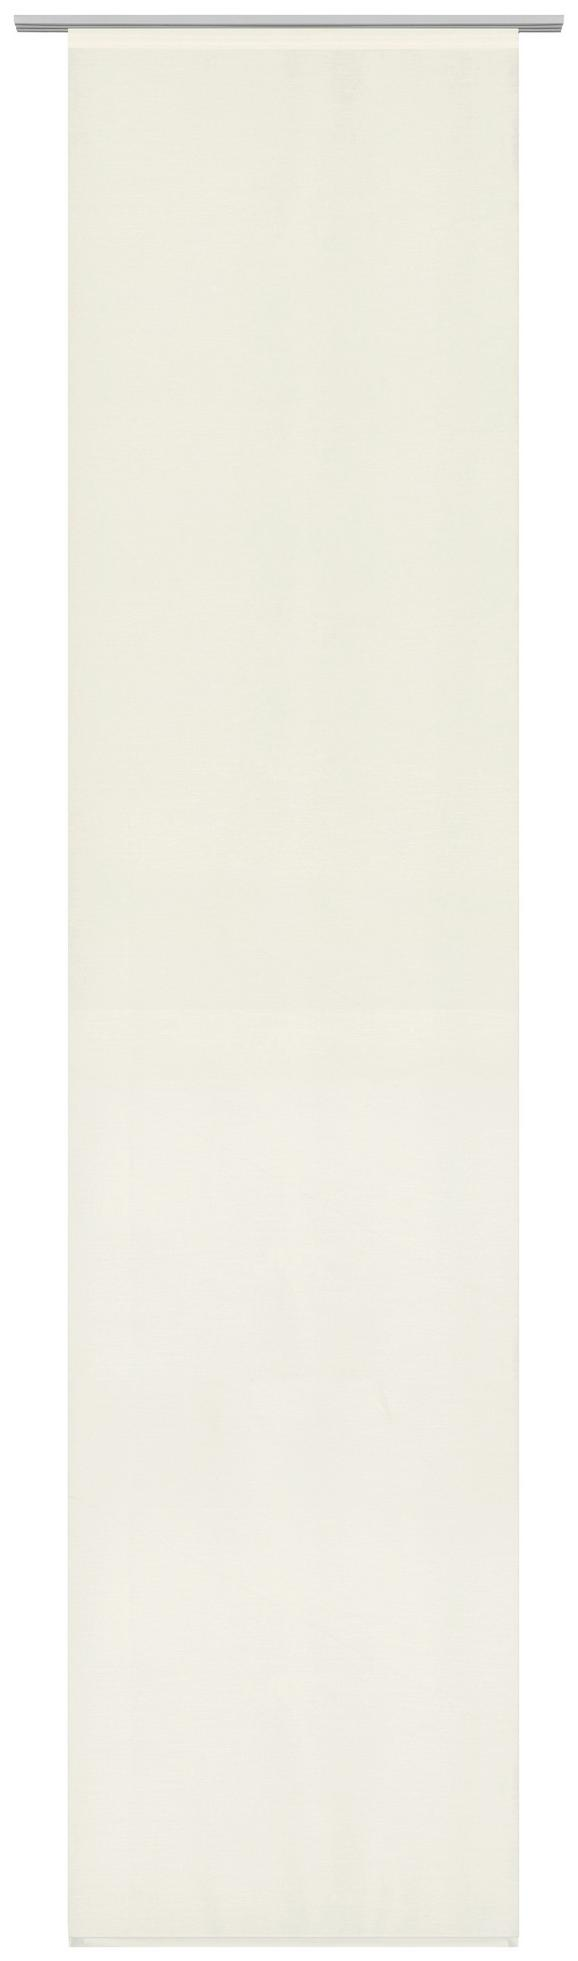 Flächenvorhang Uni Naturfarben 60x245cm - Naturfarben, MODERN, Textil (60/245cm) - Mömax modern living